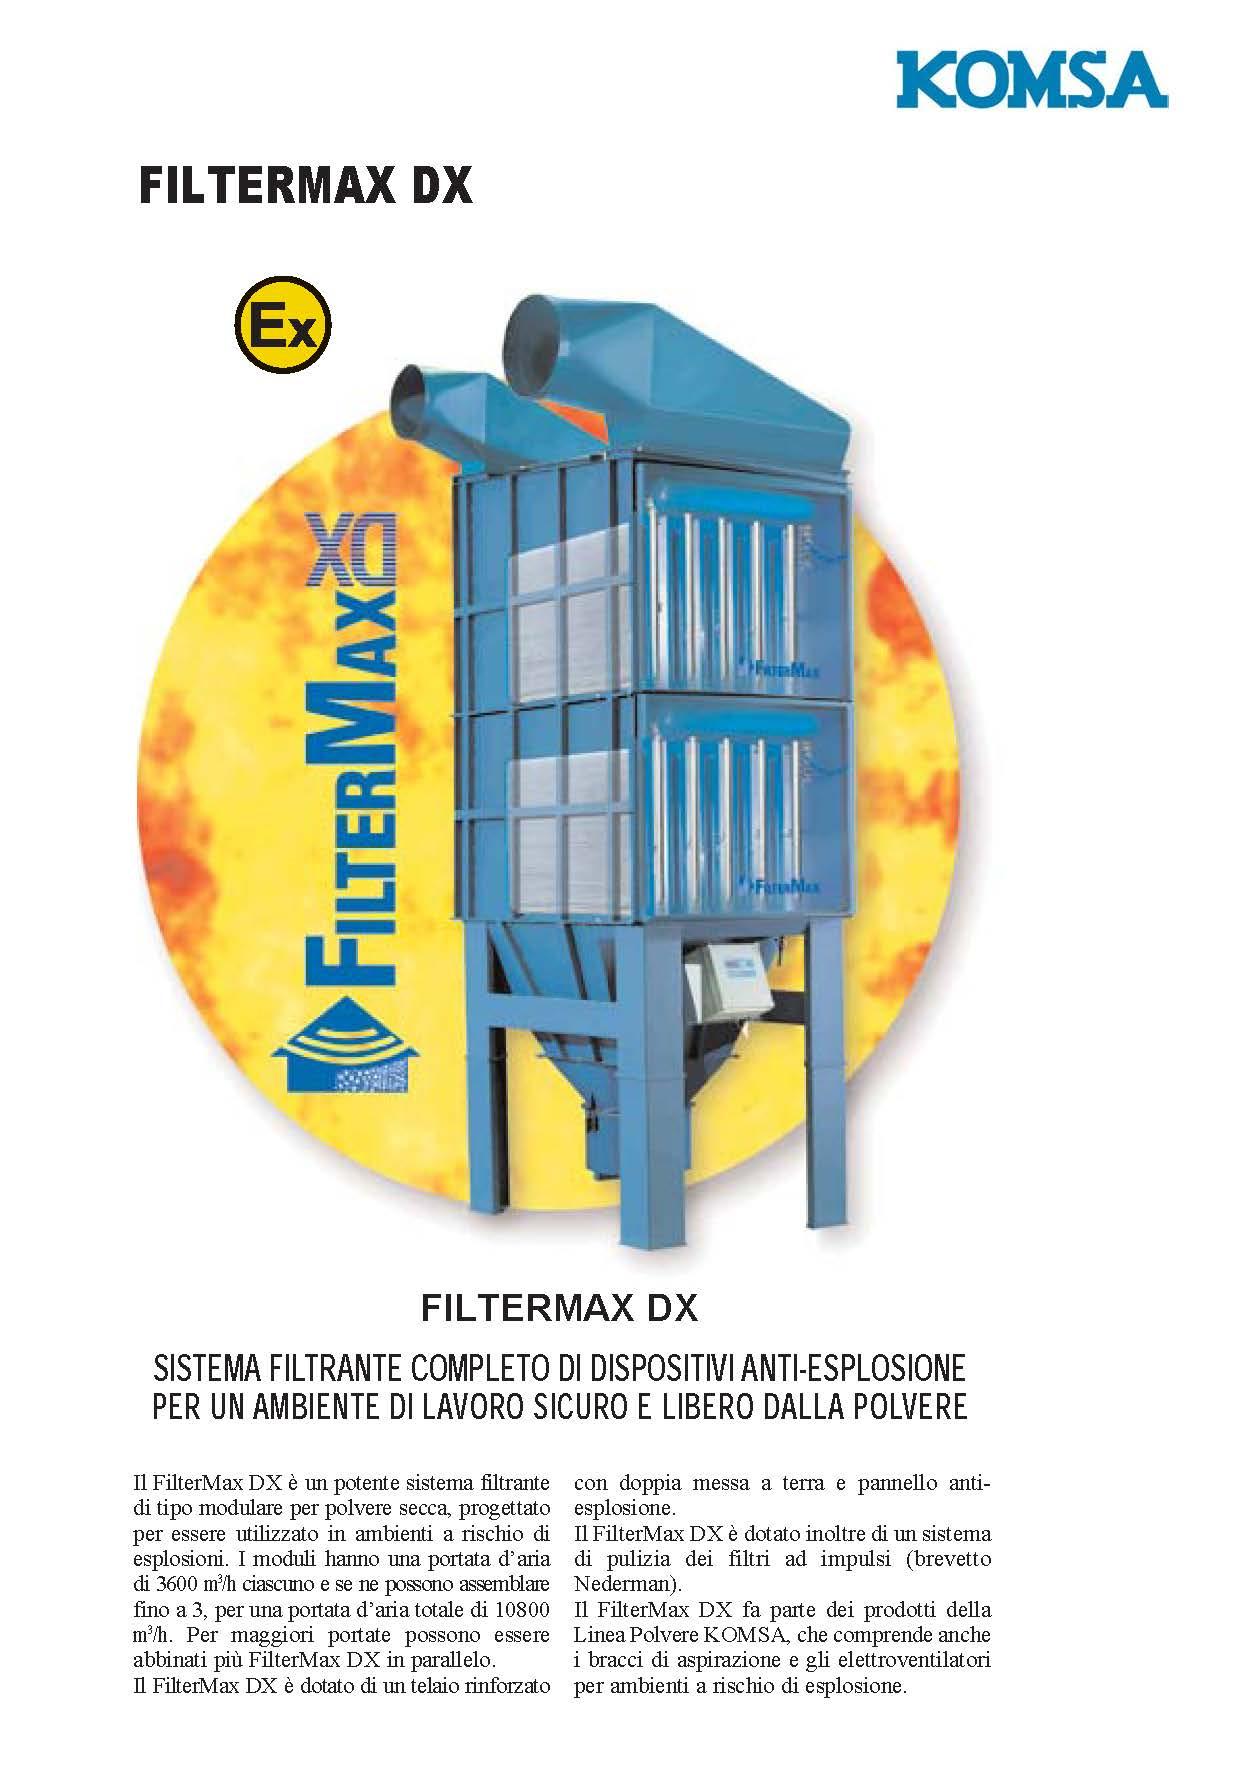 Filtermax DX